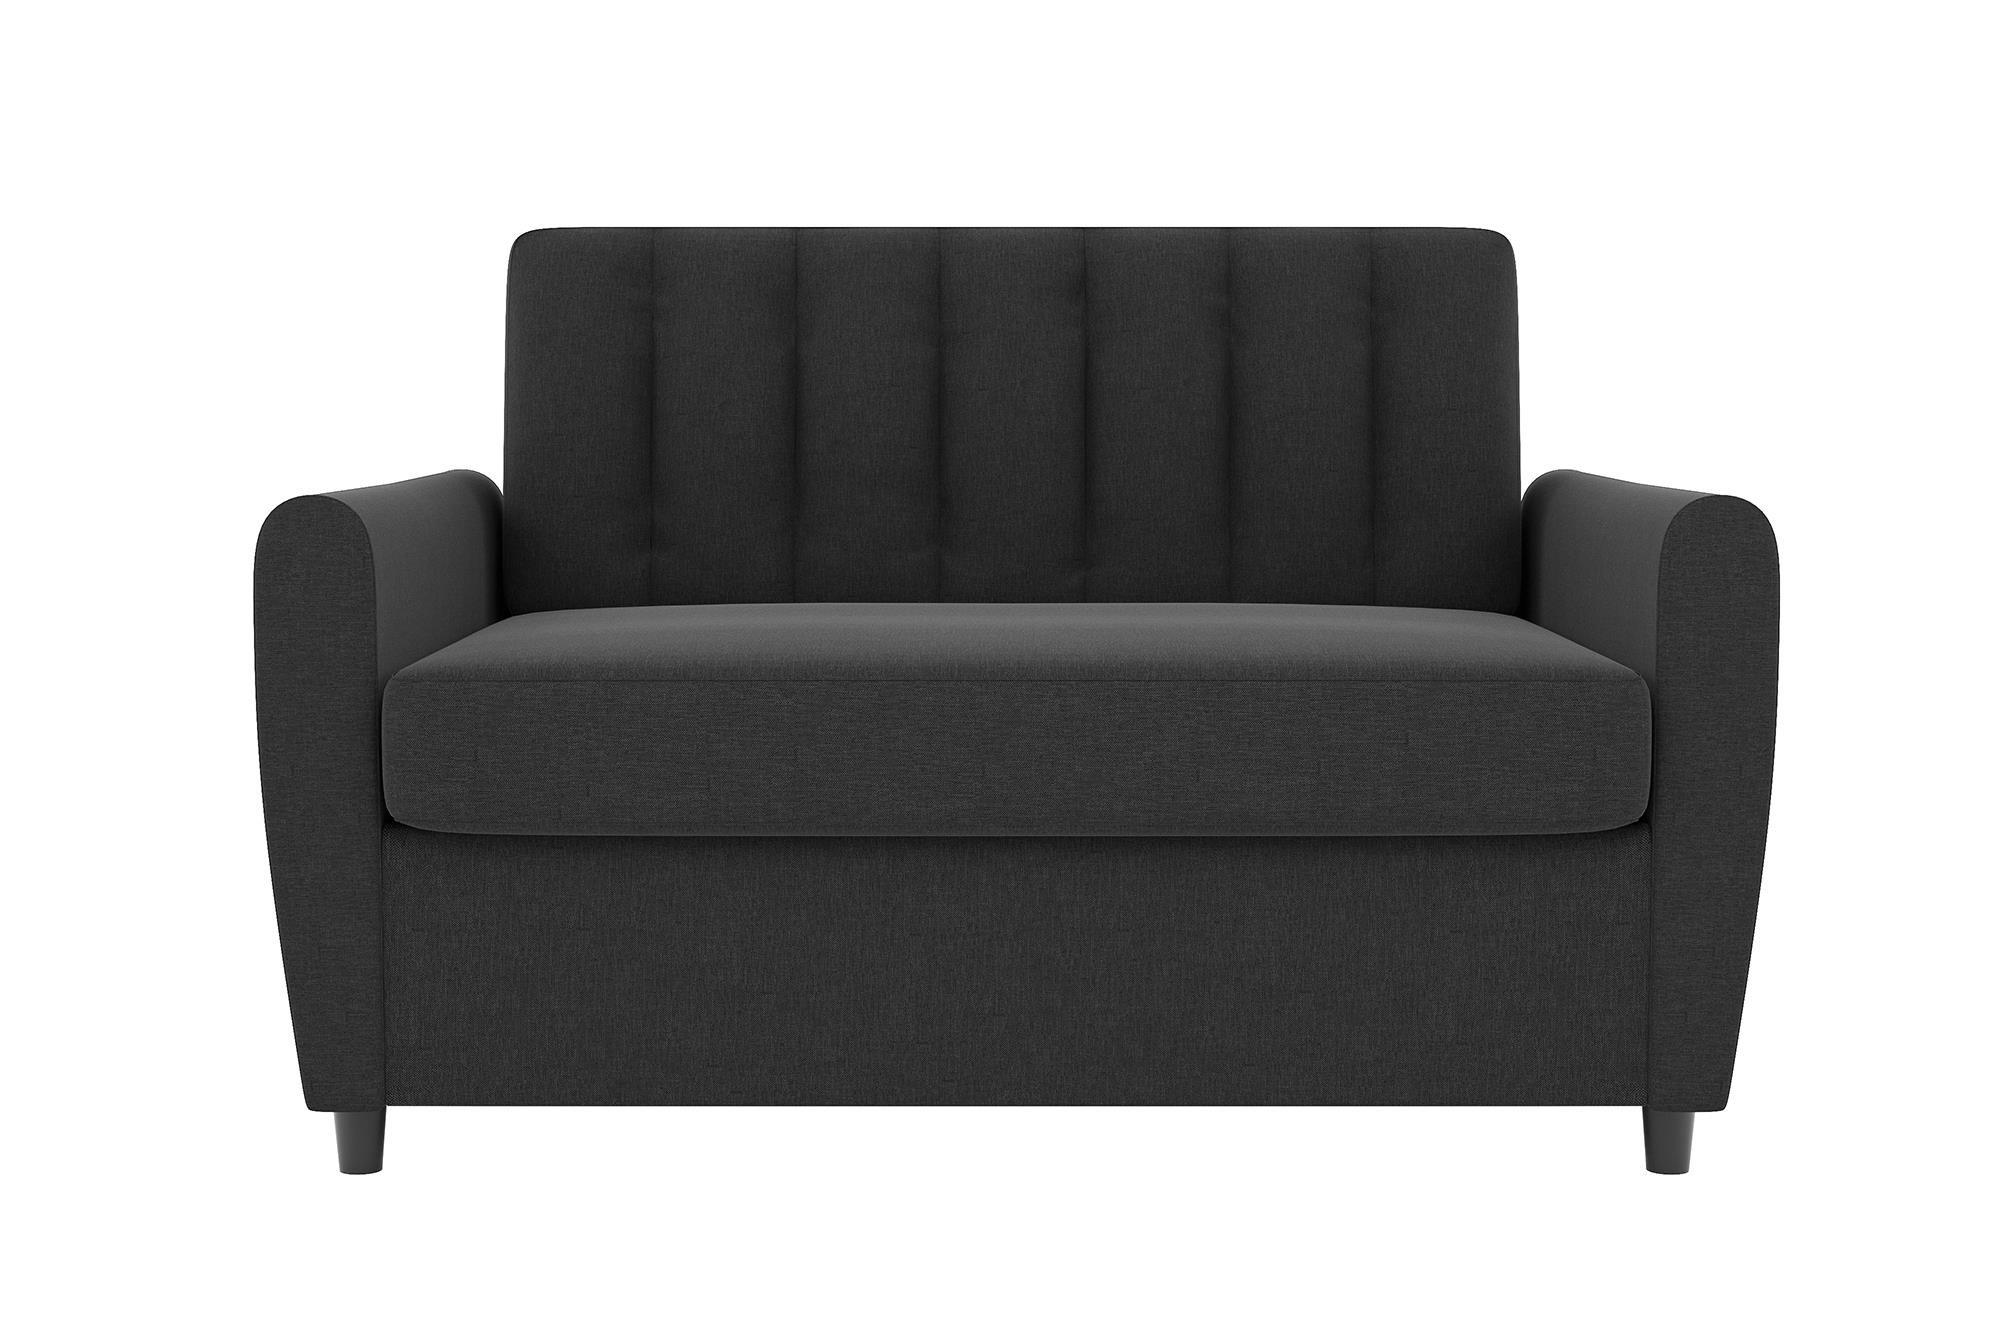 Brittany Sleeper Sofa Bed